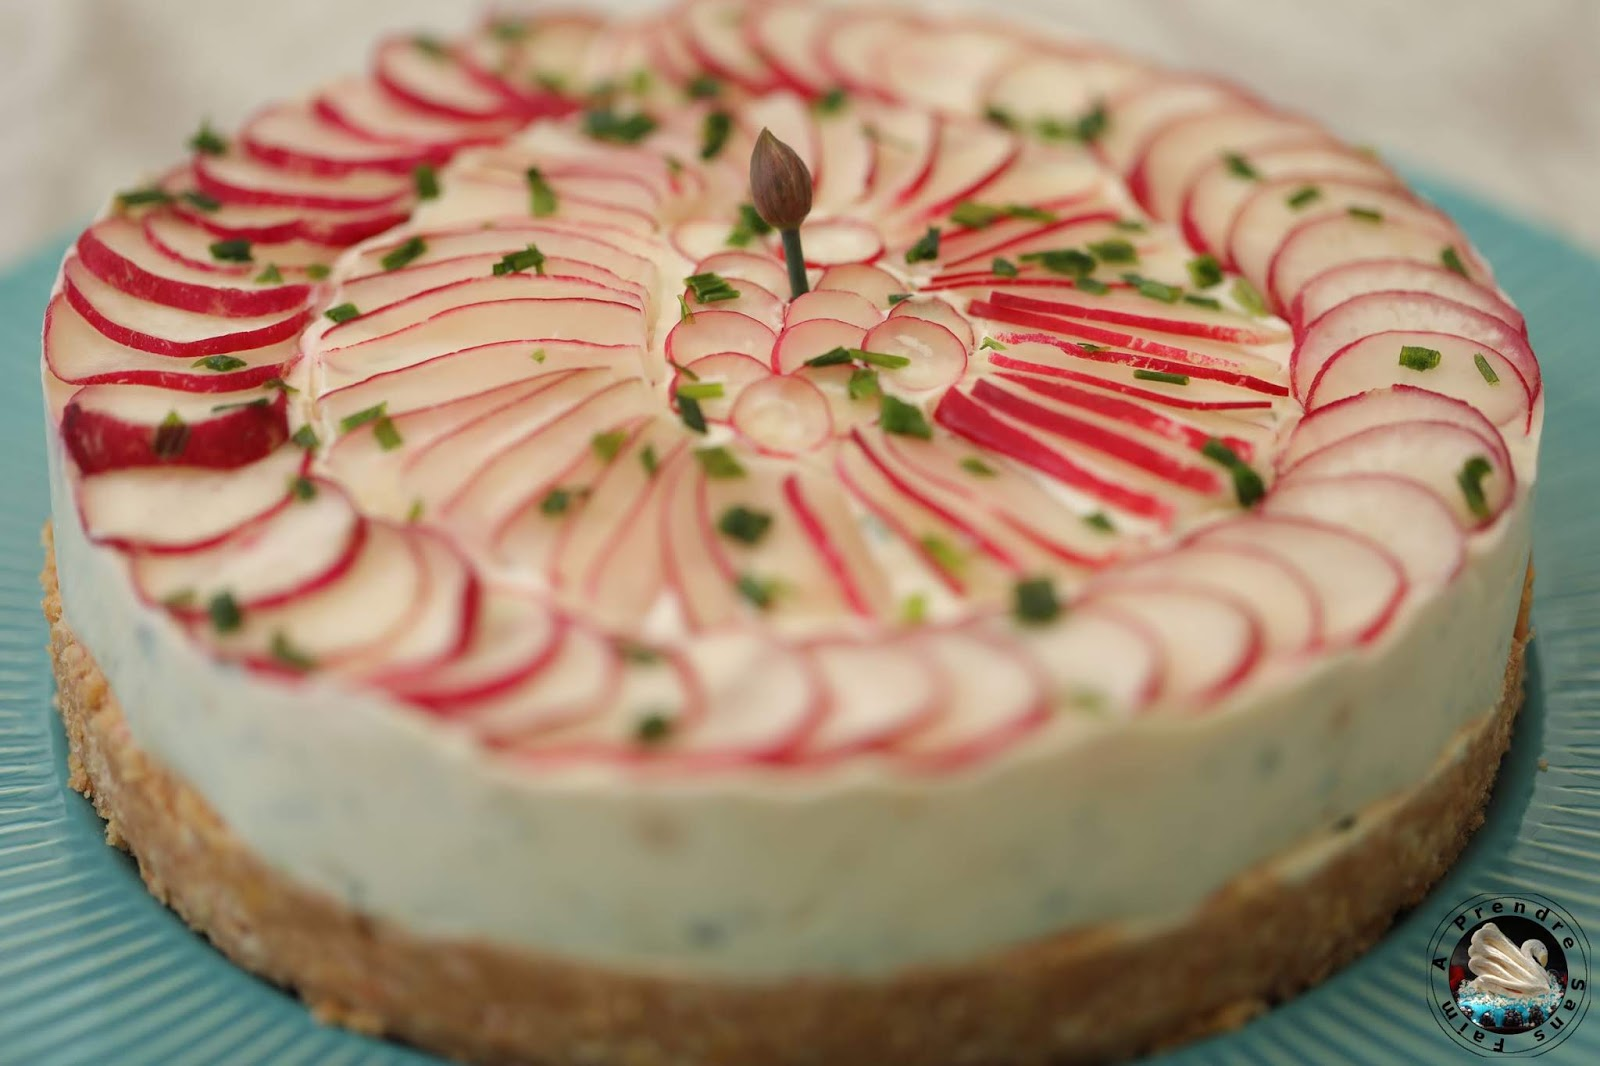 Cheesecake aux radis